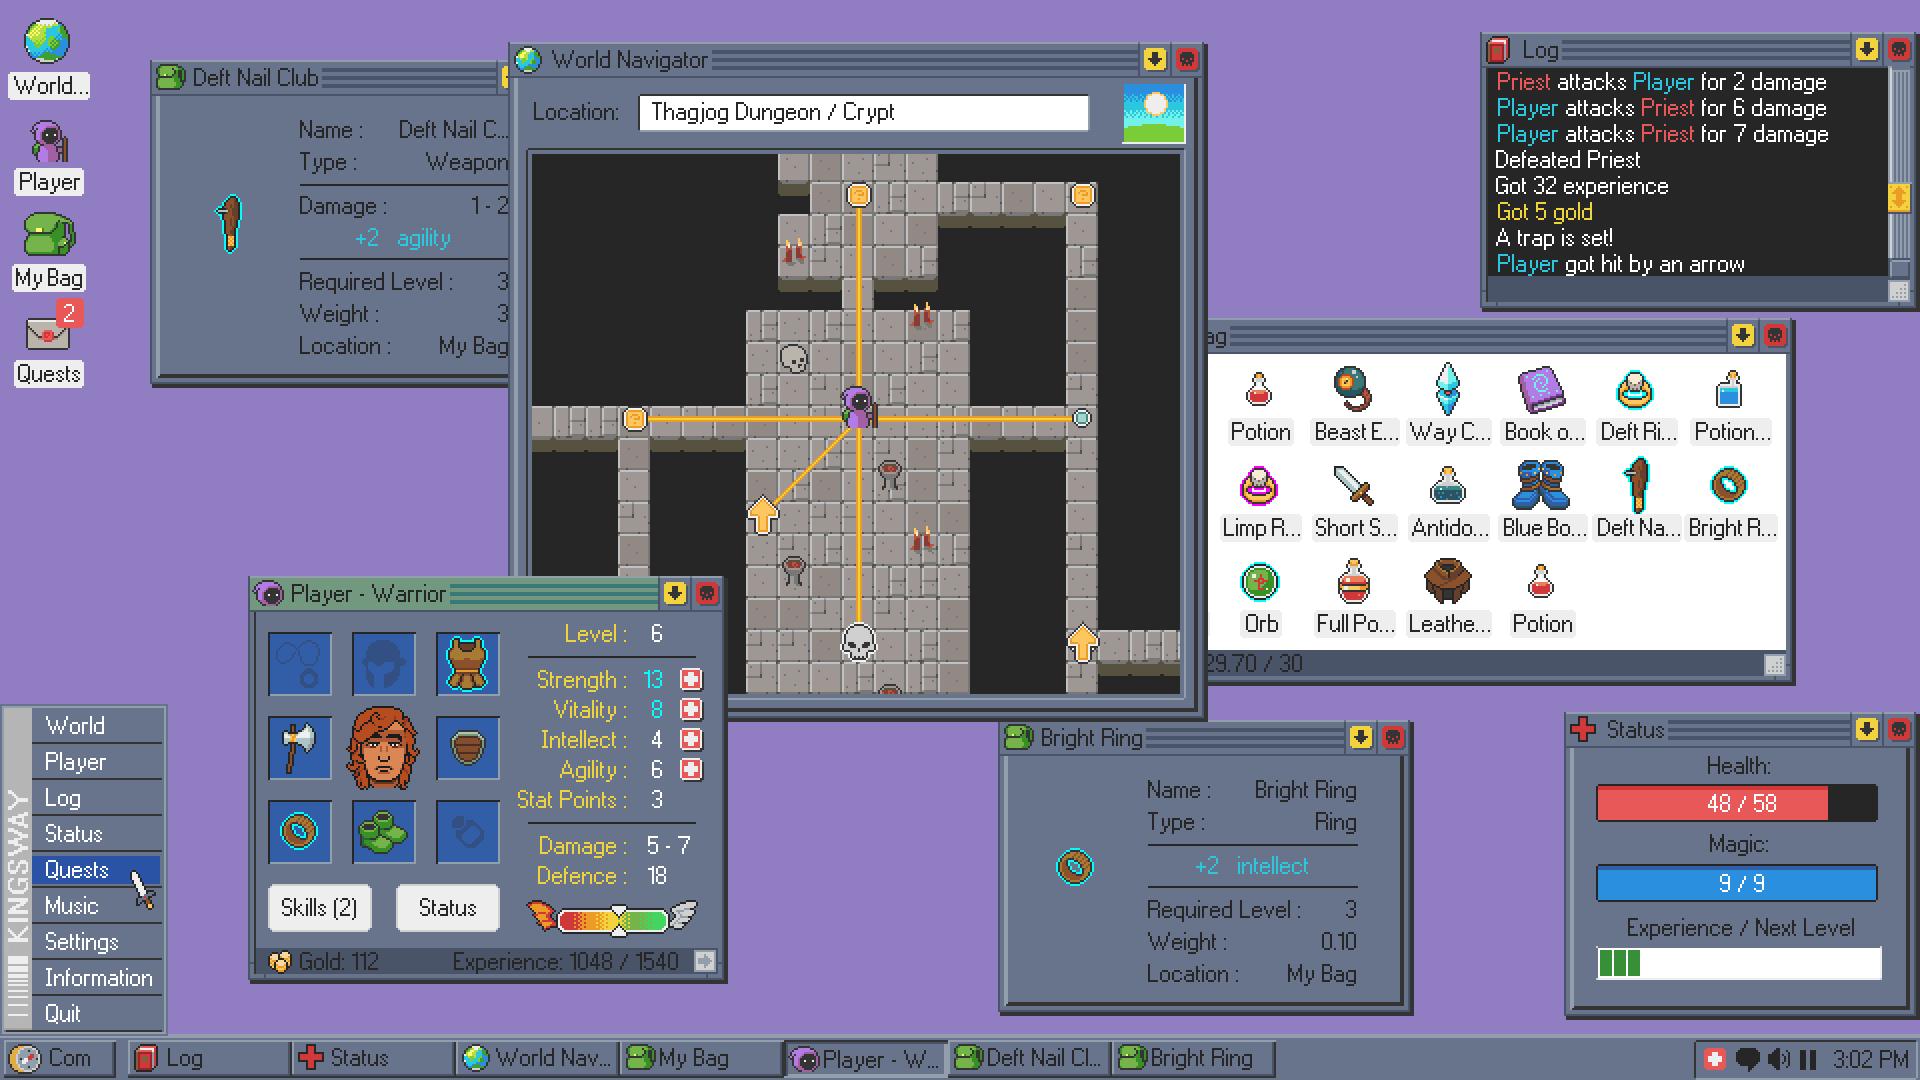 screenshot07.png